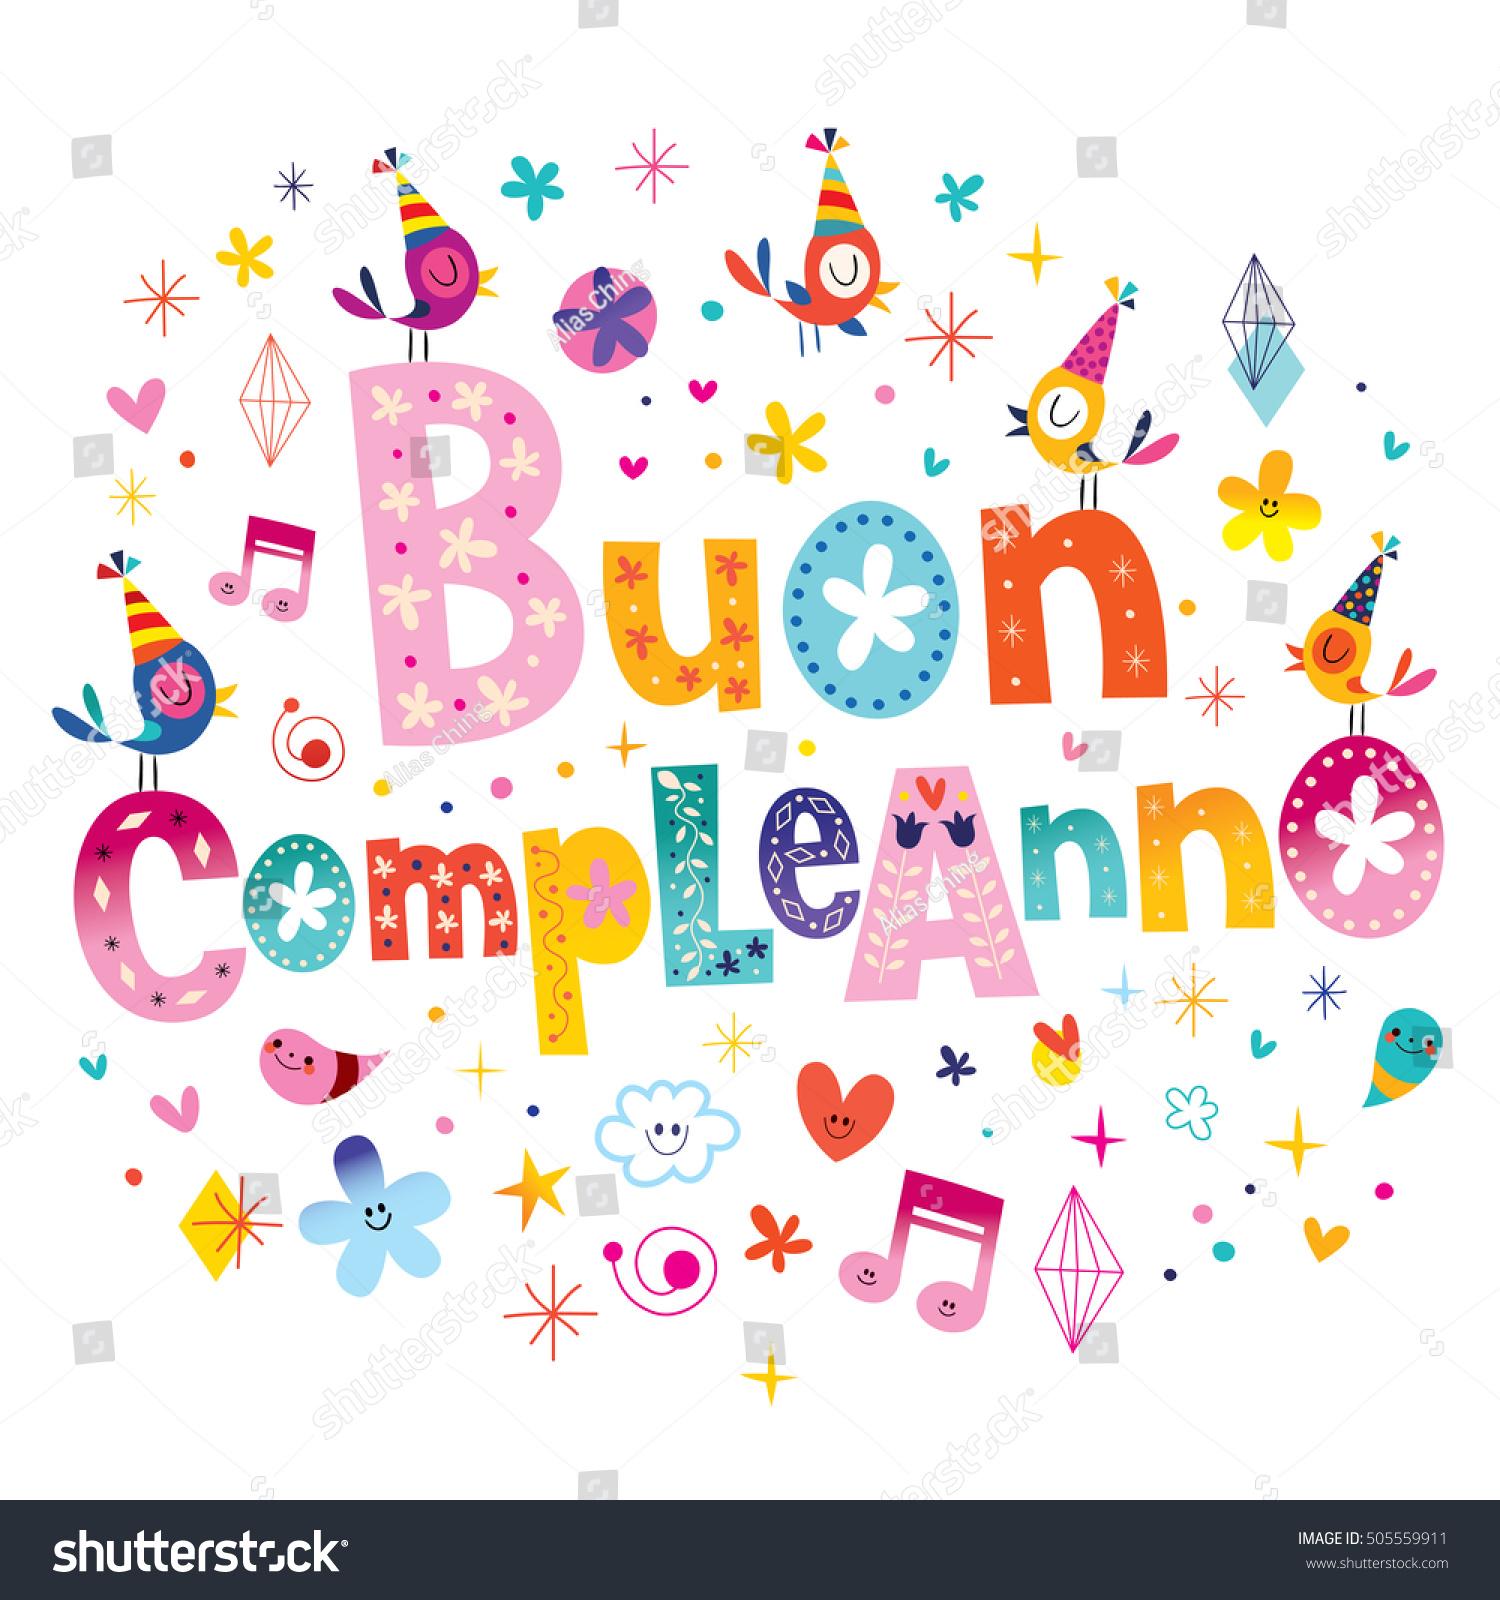 Buon Compleanno Happy Birthday Italian Greeting Stock